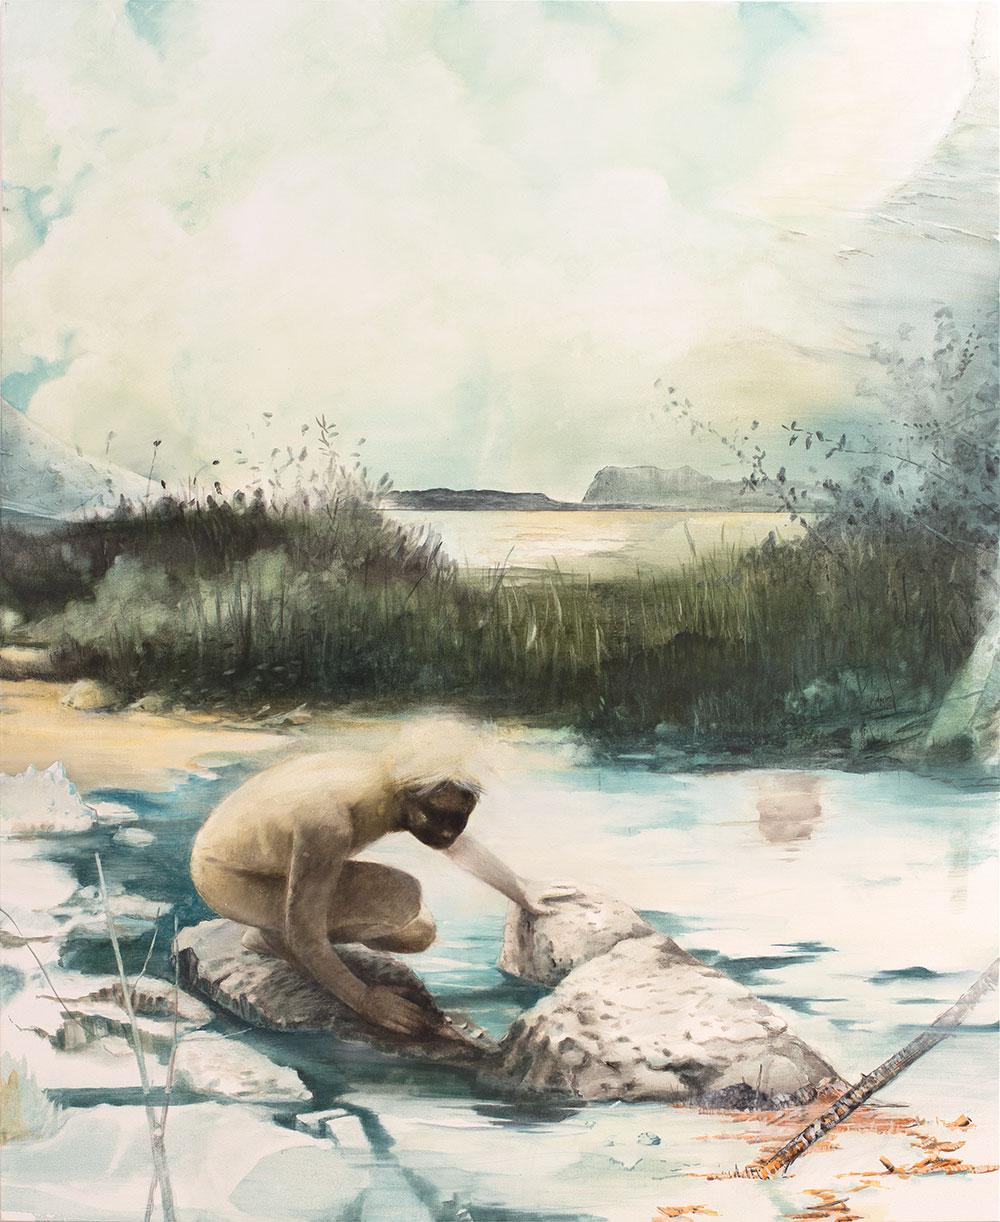 Thomas Ritz   O.T. (KatNr2020-1119), 184 x 150 cm, 2020